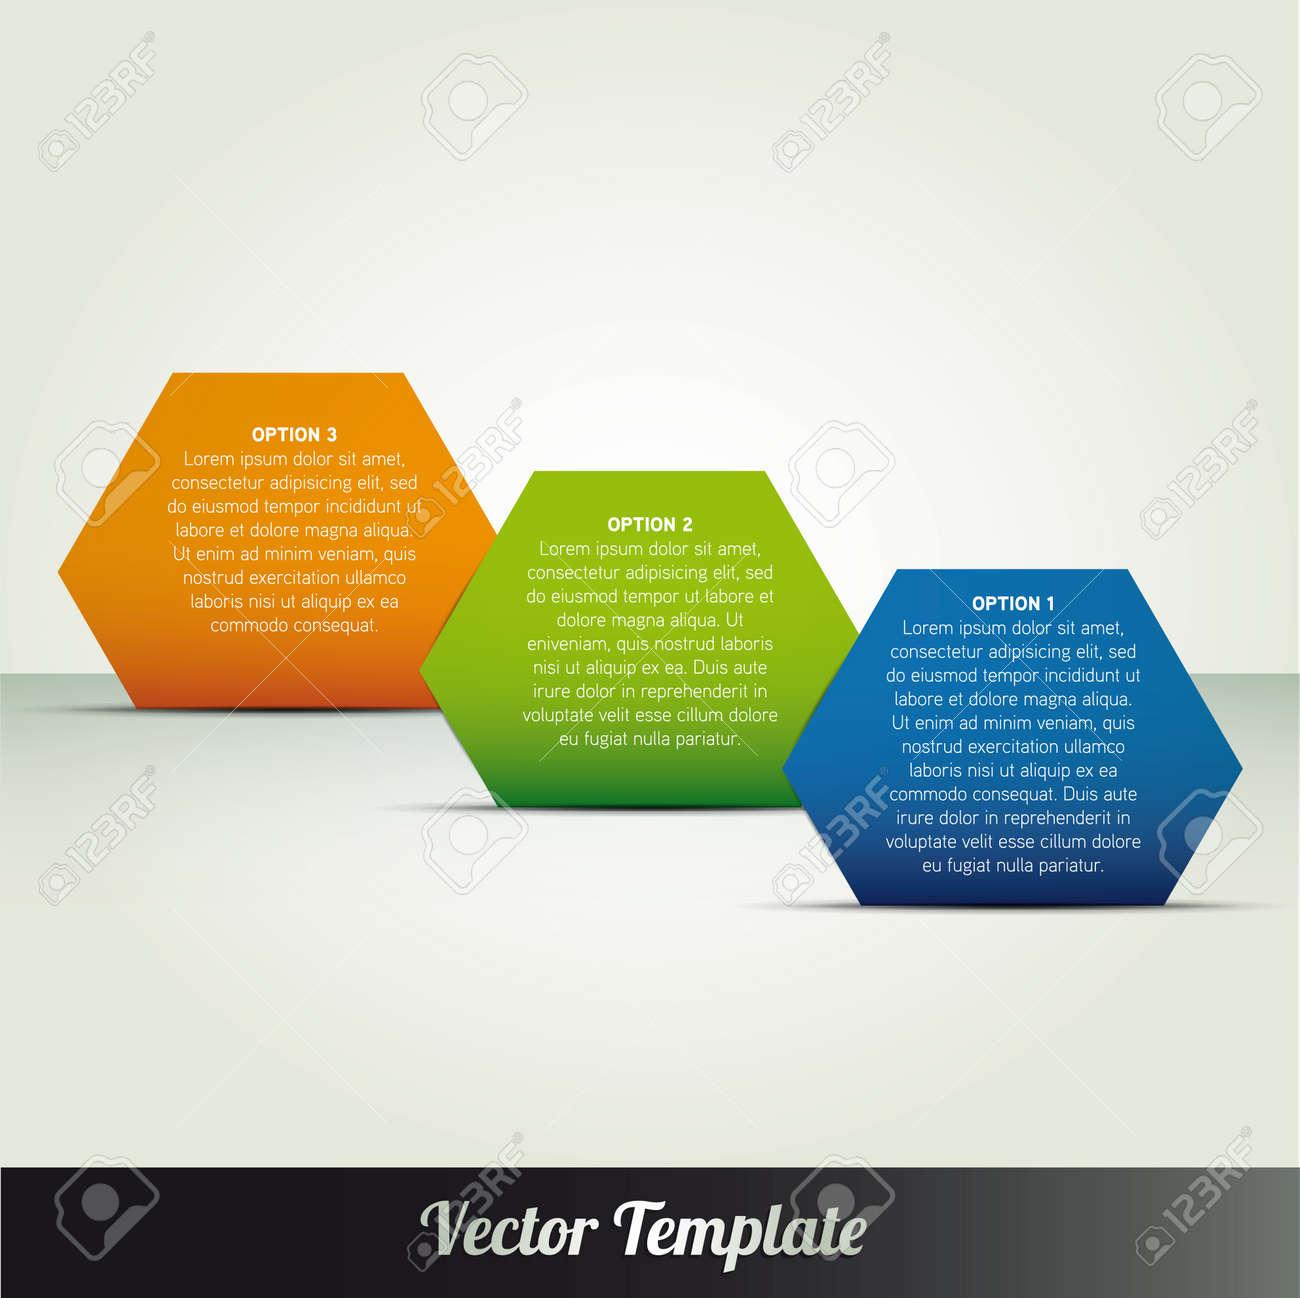 Template, vector eps10 illustration Stock Vector - 18132698